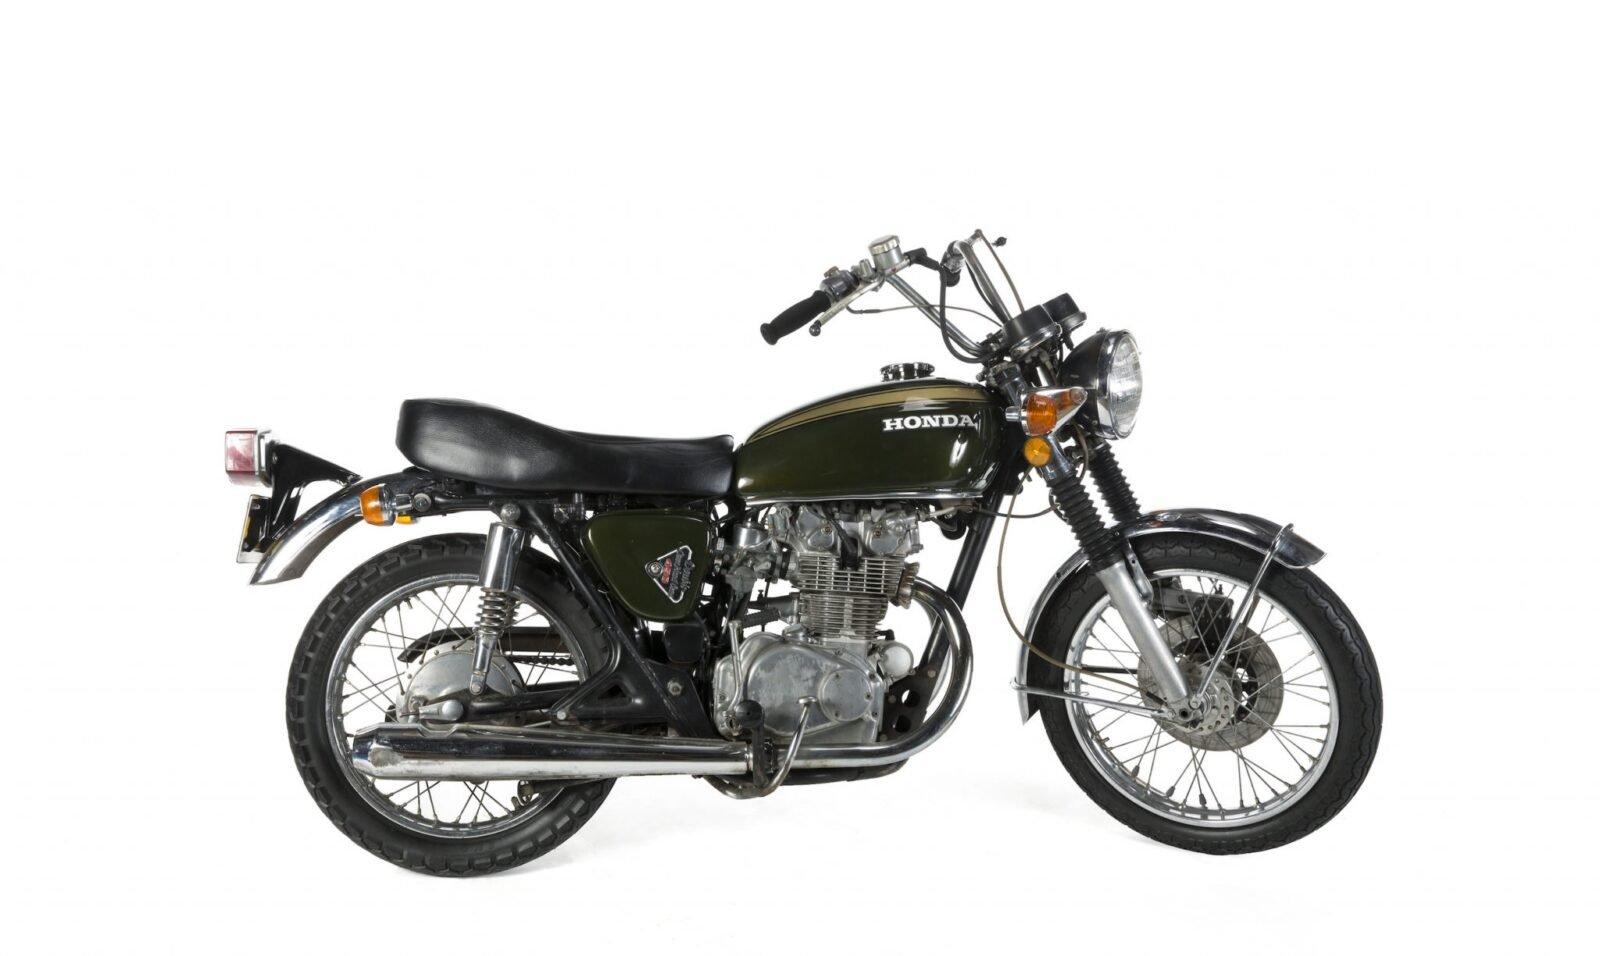 Steve McQueen Motorcycle 1600x956 - Steve McQueen's Honda CB450